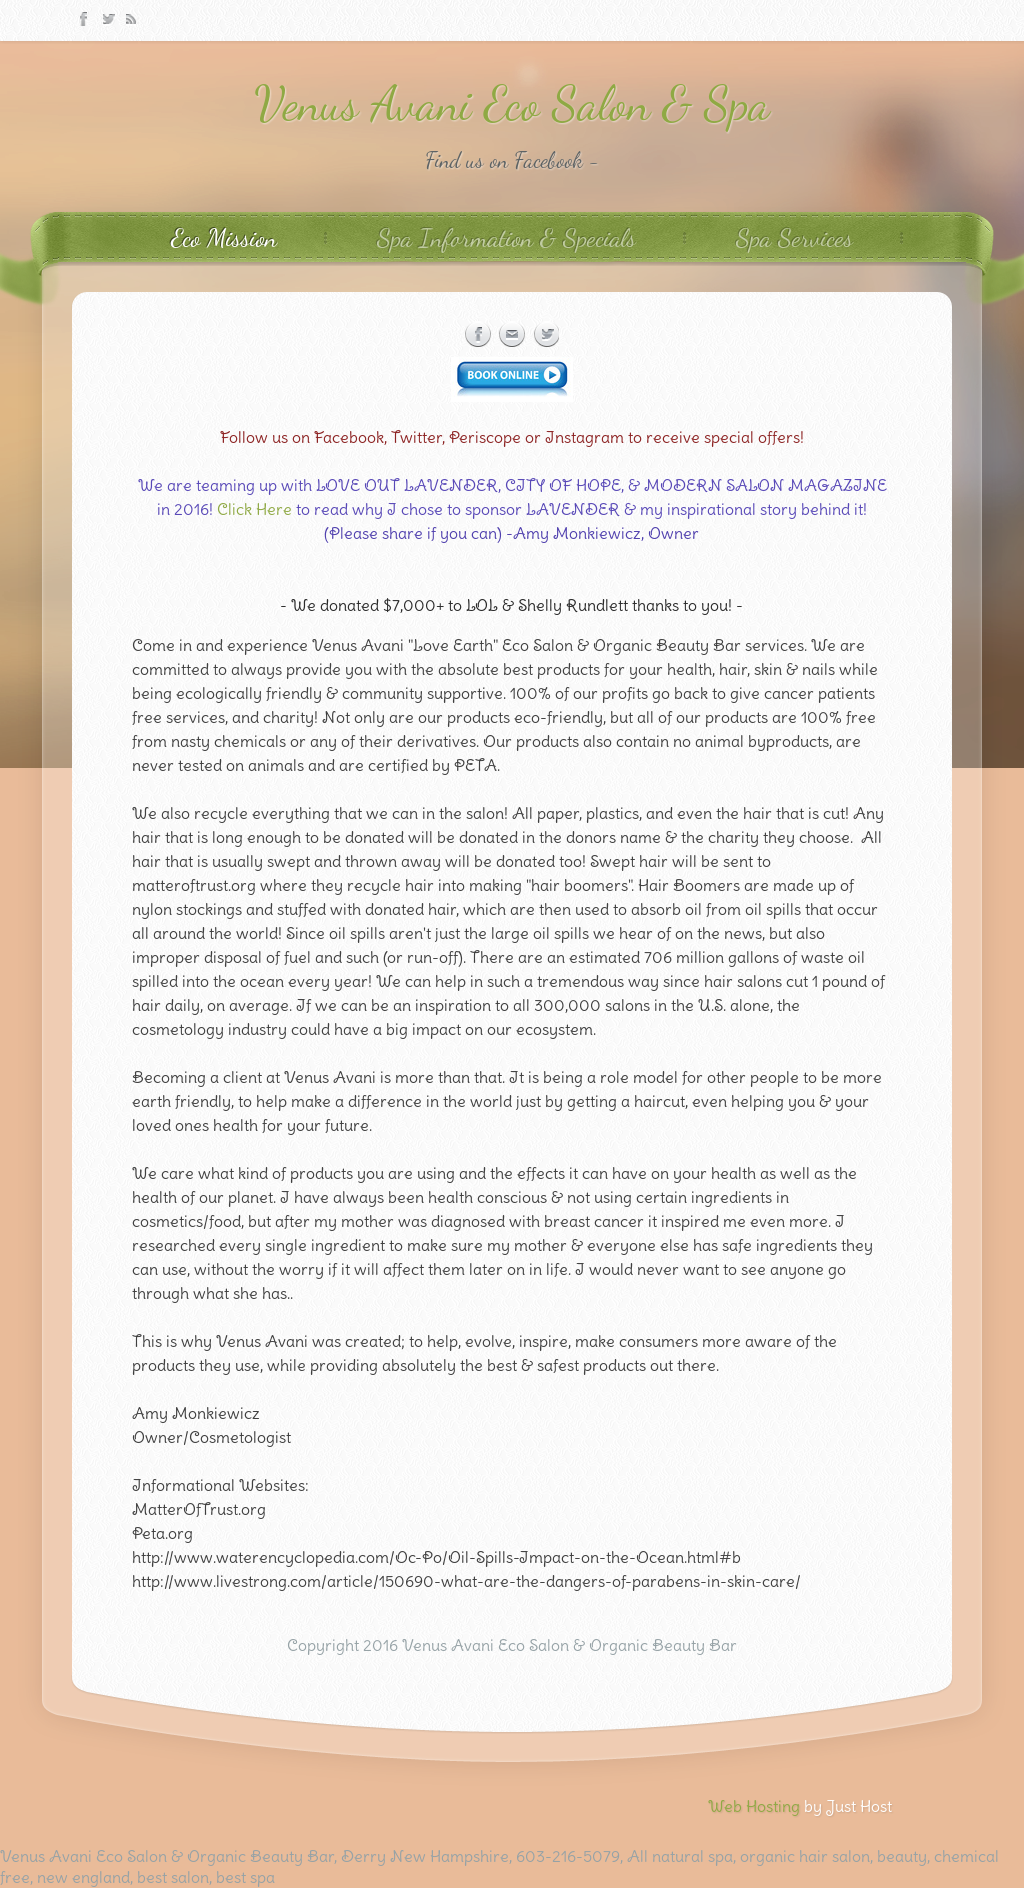 Venus Avani Eco Salon & Organic Beauty Bar Competitors, Revenue and